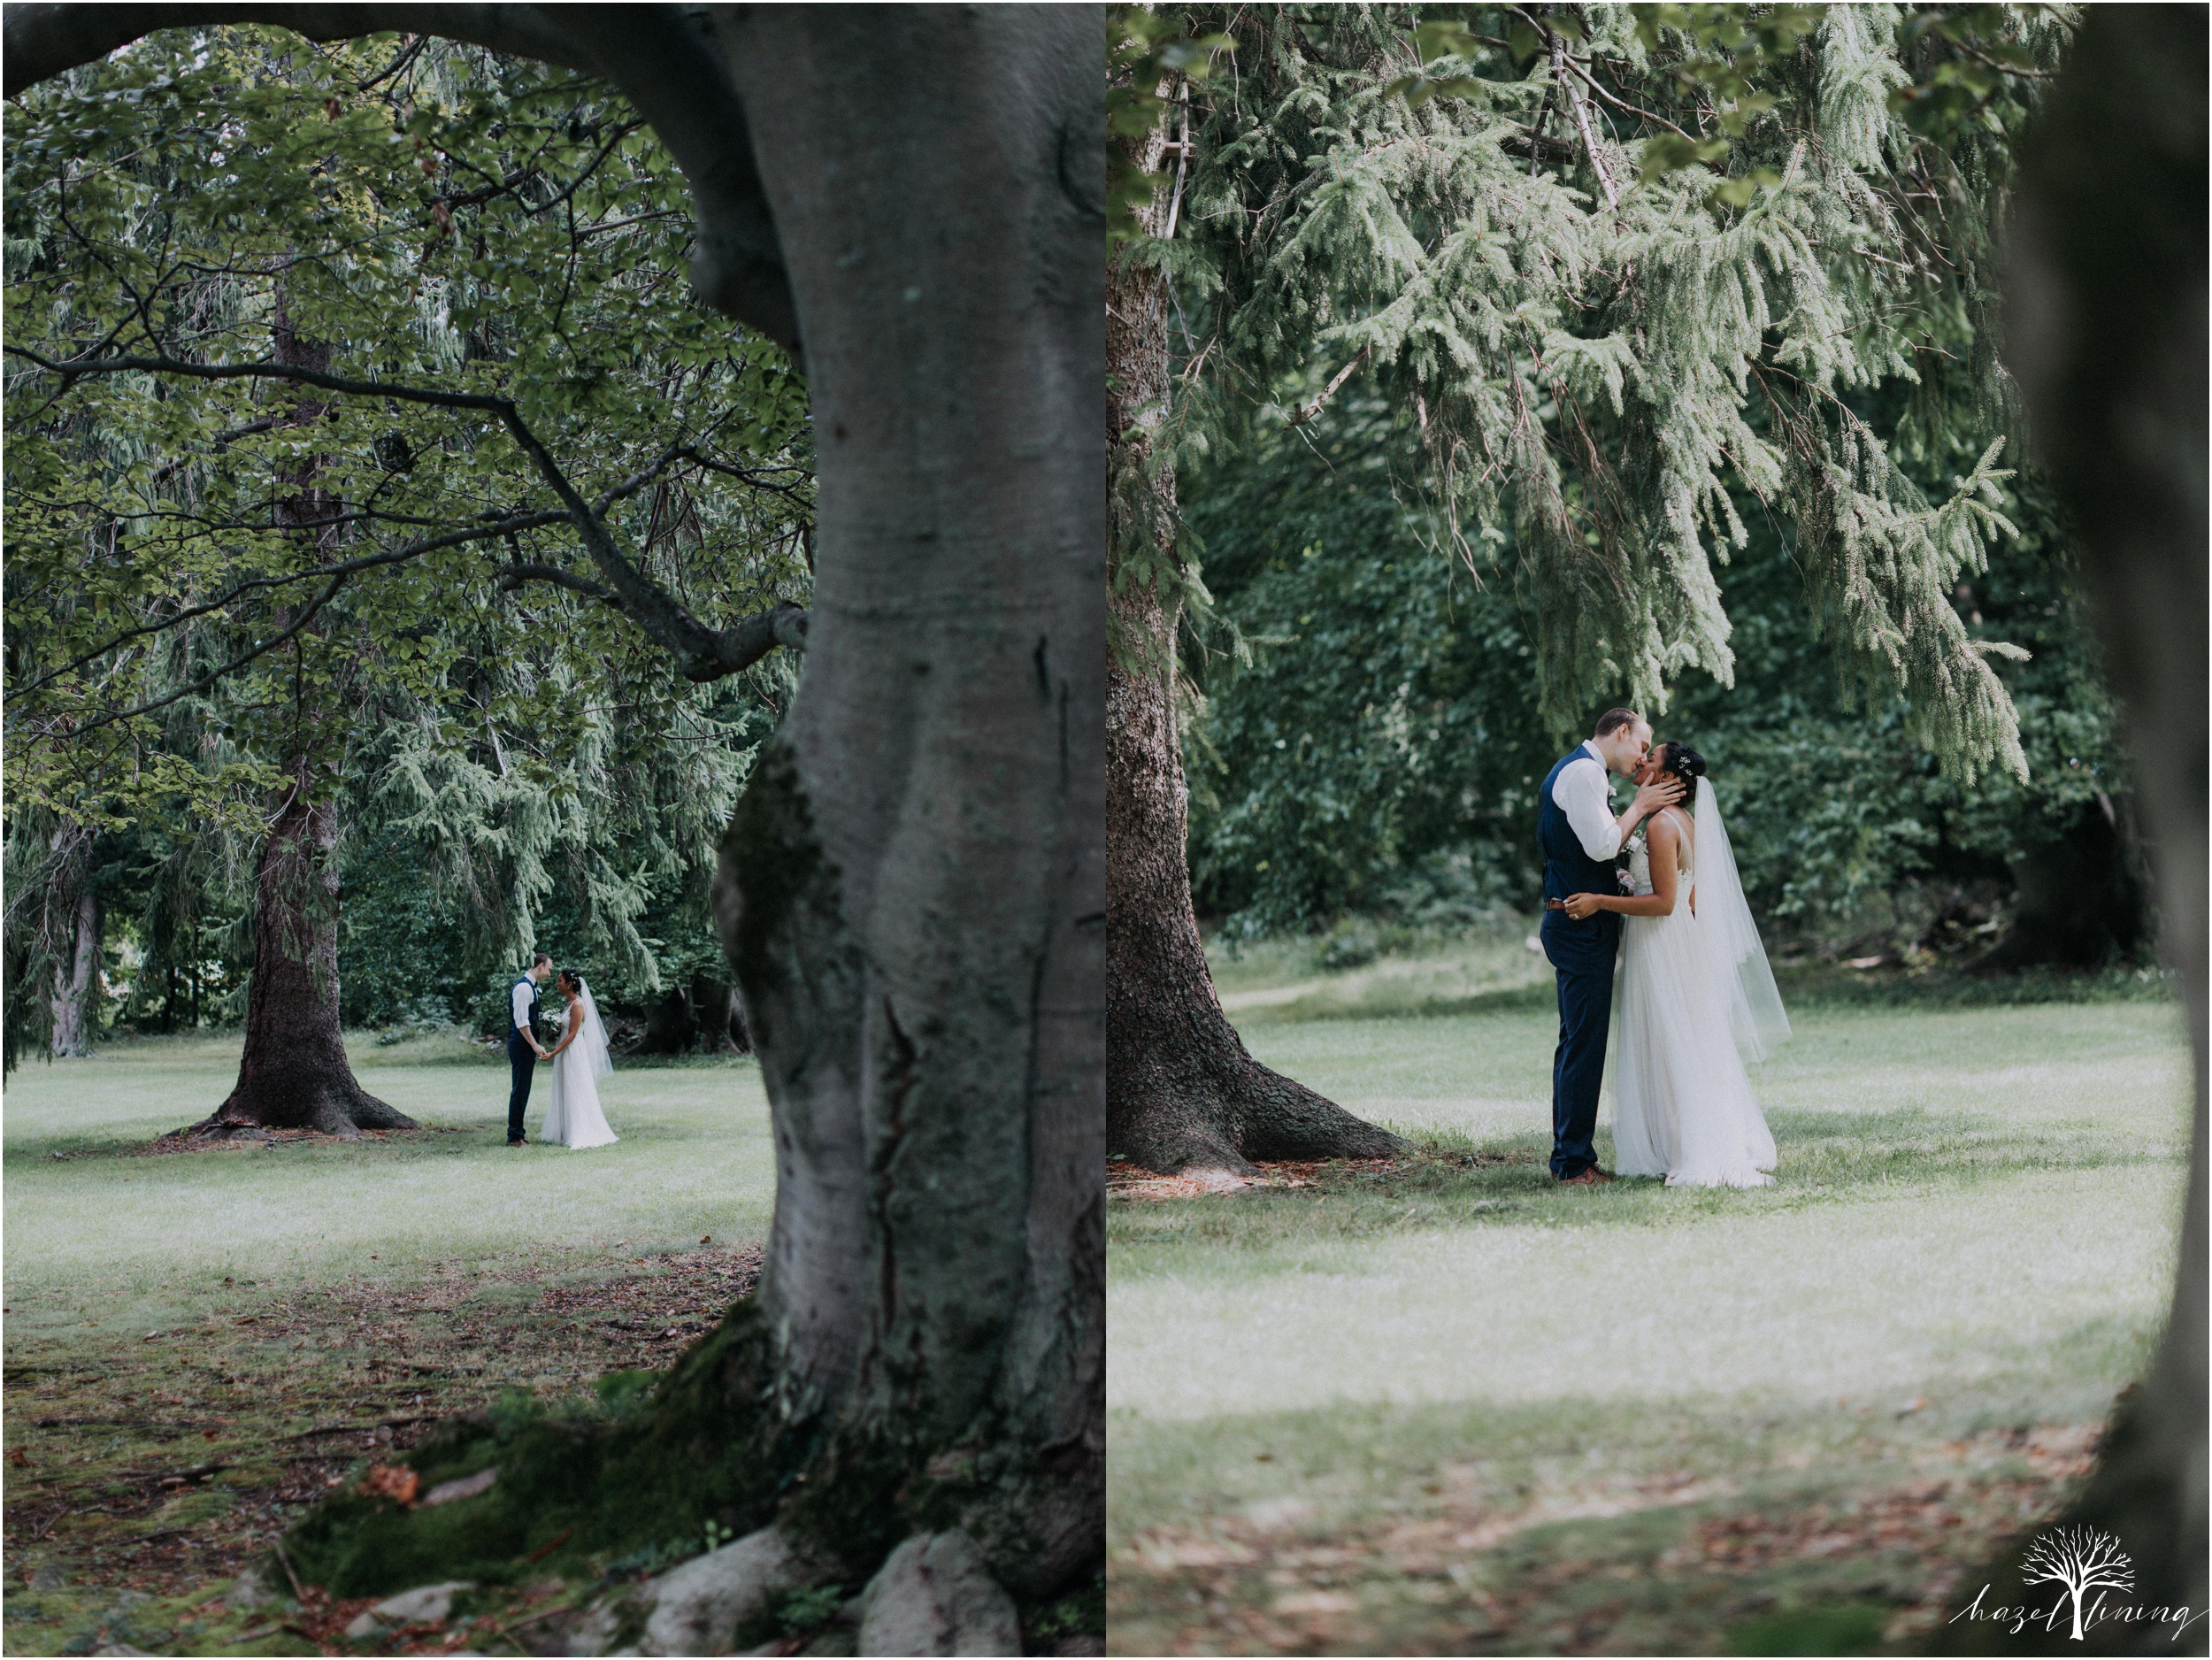 mariah-kreyling-samuel-sherratt-sherrattwiththeworld-peirce-farm-at-witch-hill-boston-massachusetts-wedding-photography-hazel-lining-travel-wedding-elopement-photography_0102.jpg